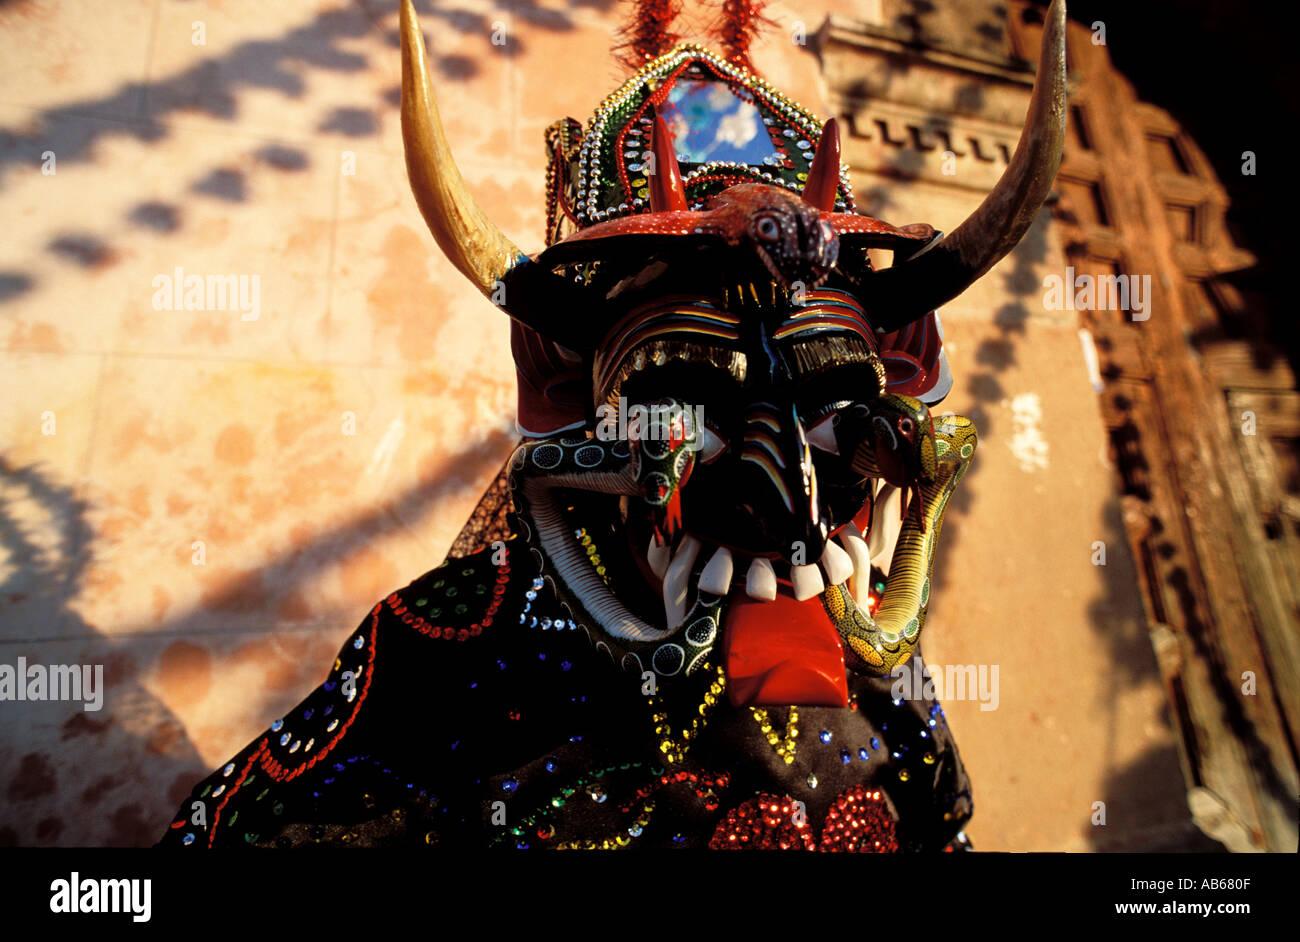 Los Pastorales devil mask in erongaricuaro mexico - Stock Image